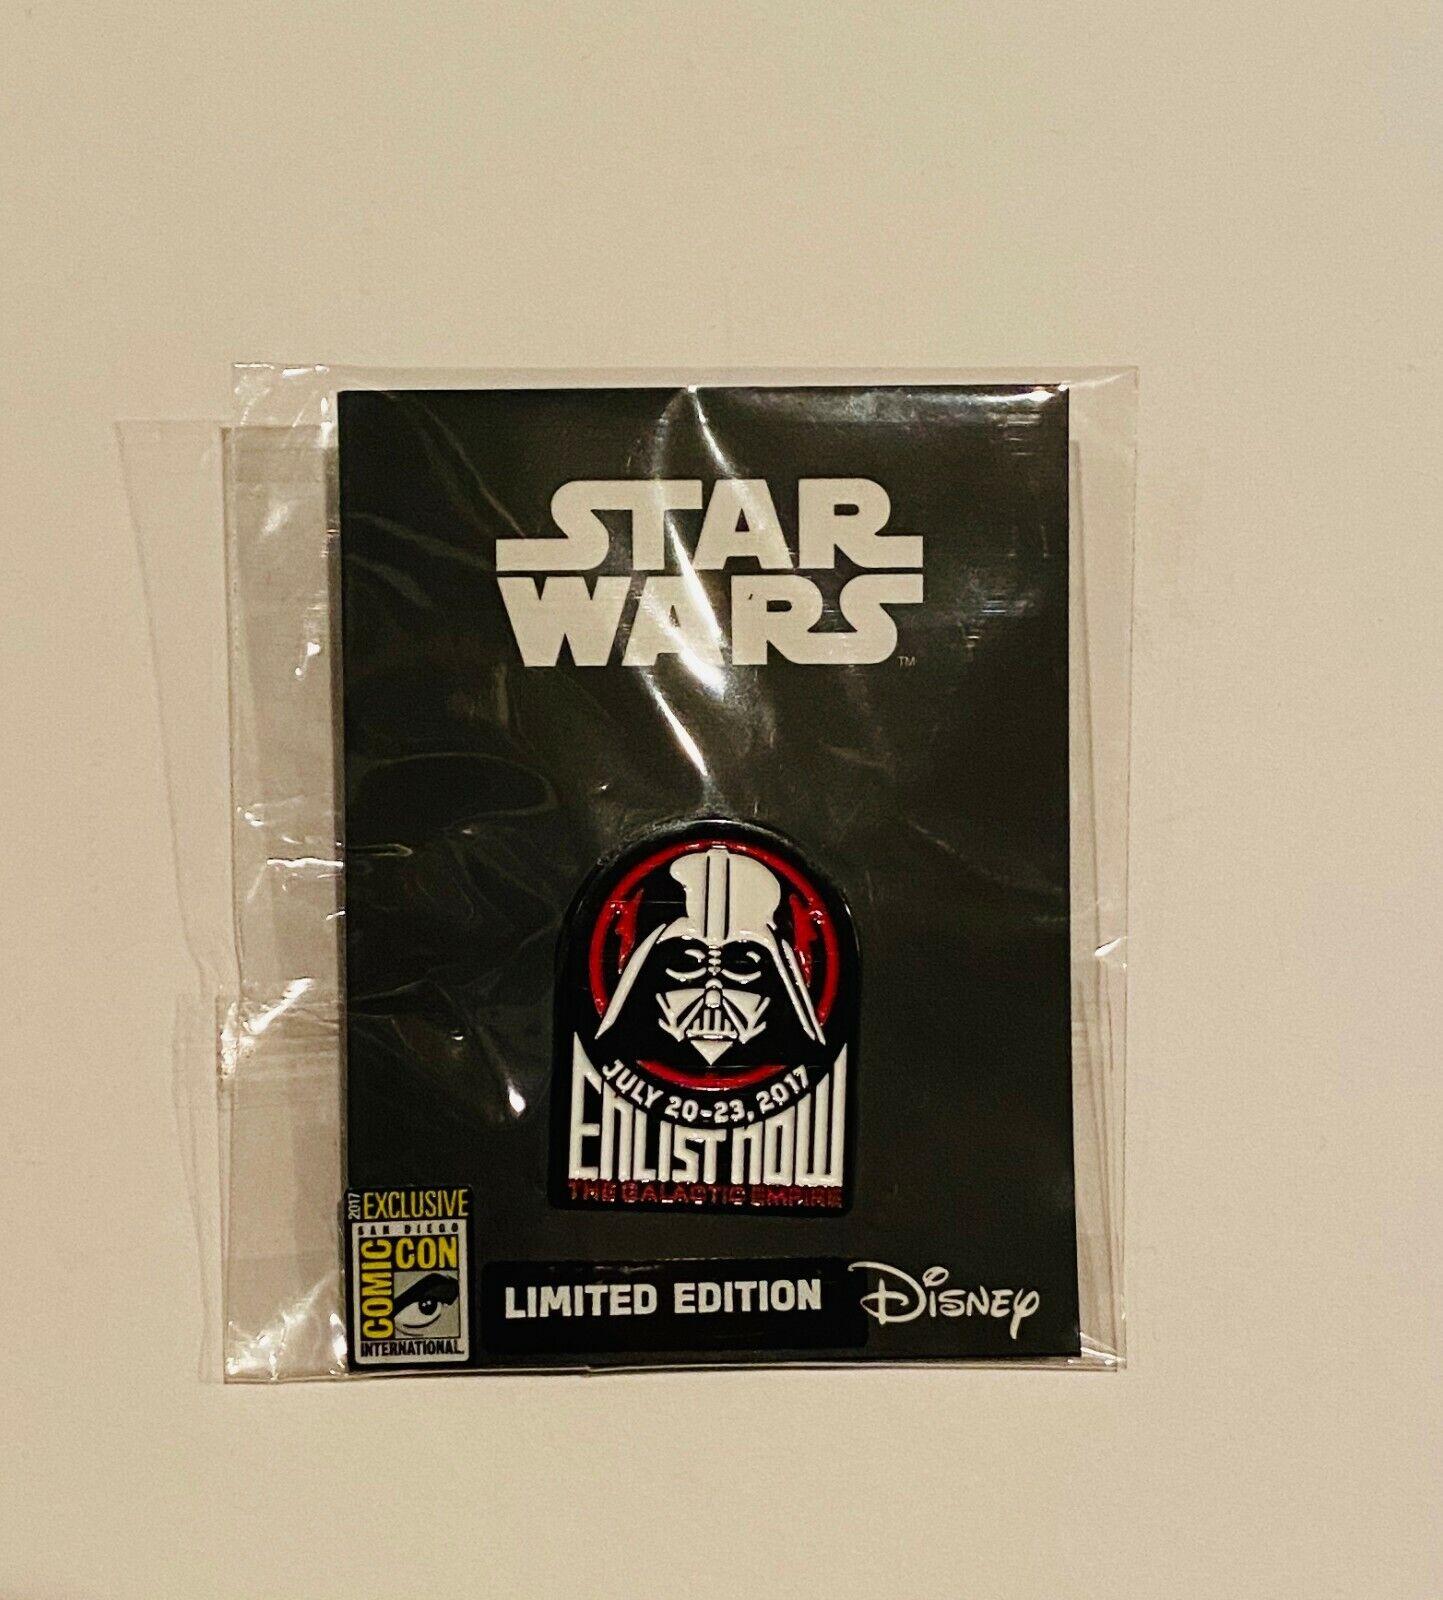 SDCC 2017 Star Wars Limited Edition Darth Vader Enlist Now Disney Enamel Pin - $20.00